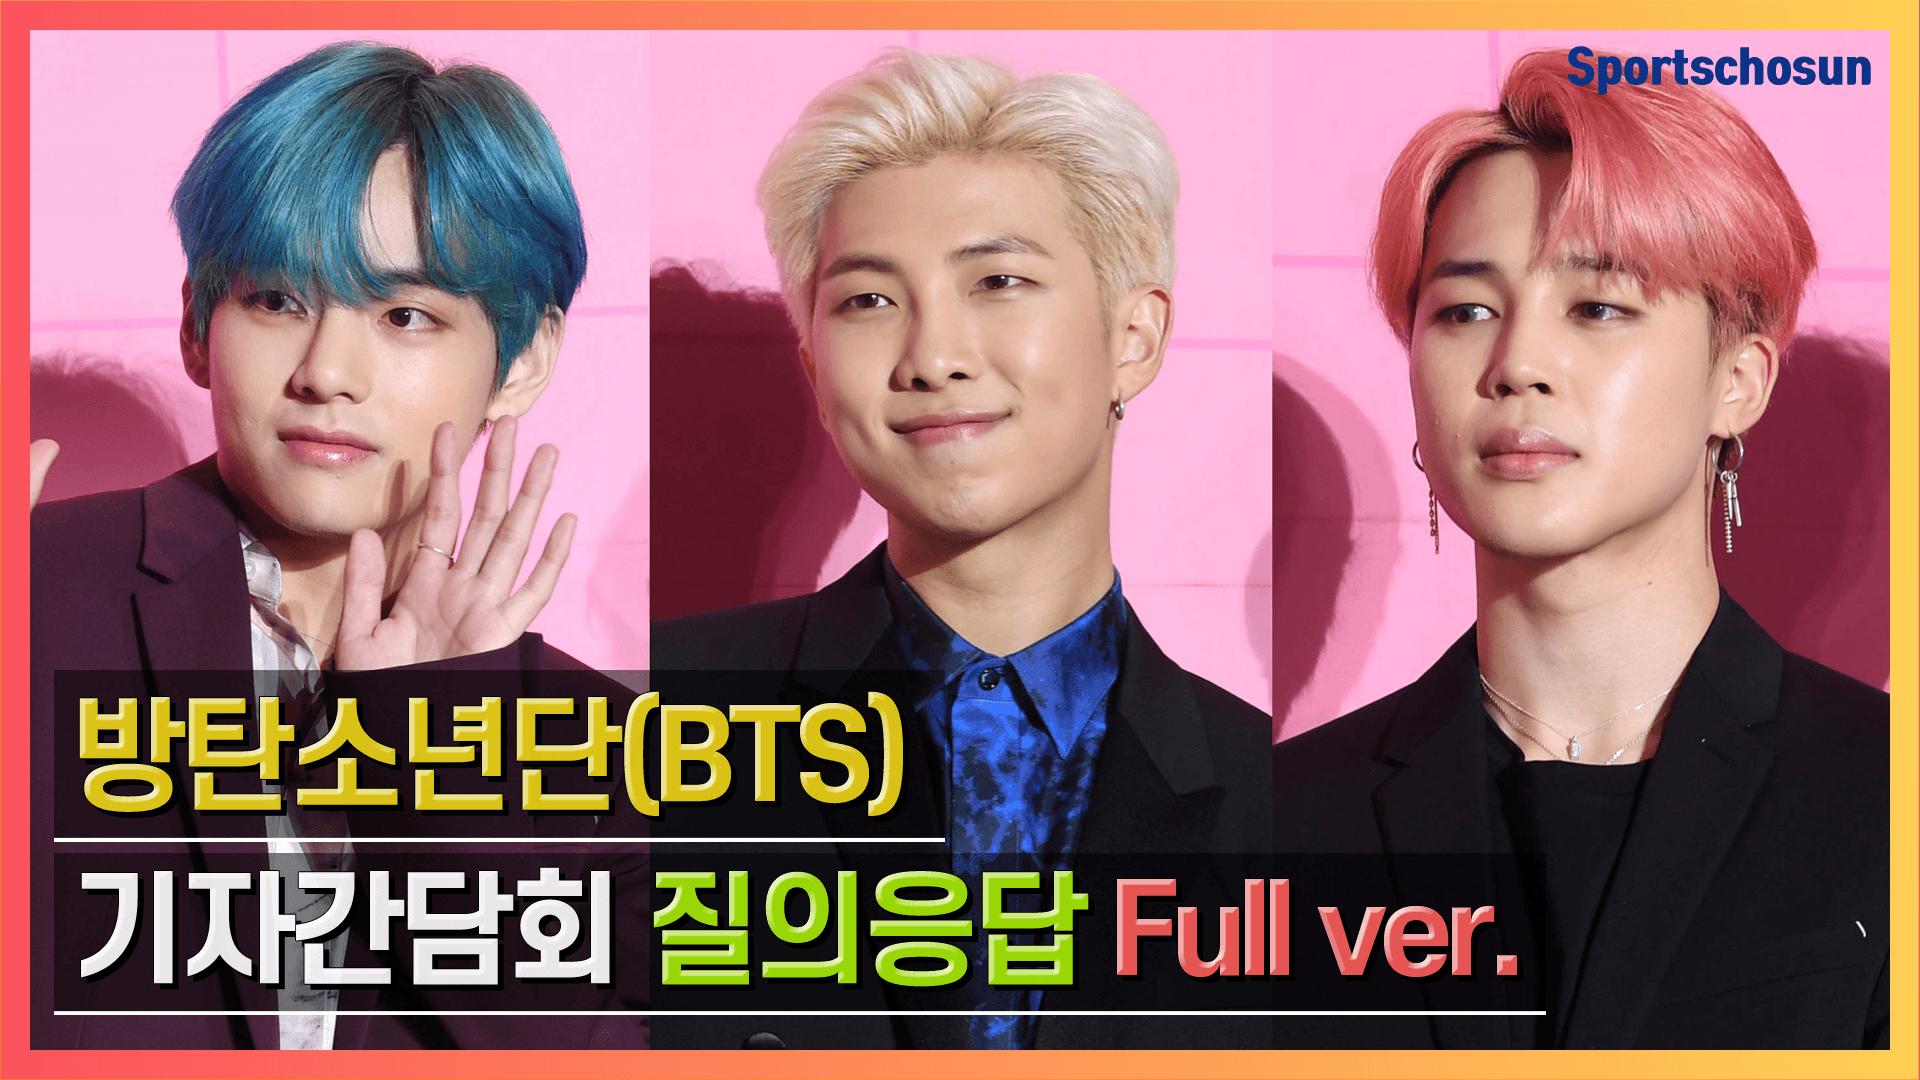 [Full] 방탄소년단(BTS) 'MAP OF THE SOUL : PERSONA' 컴백 기자회견 질의응답